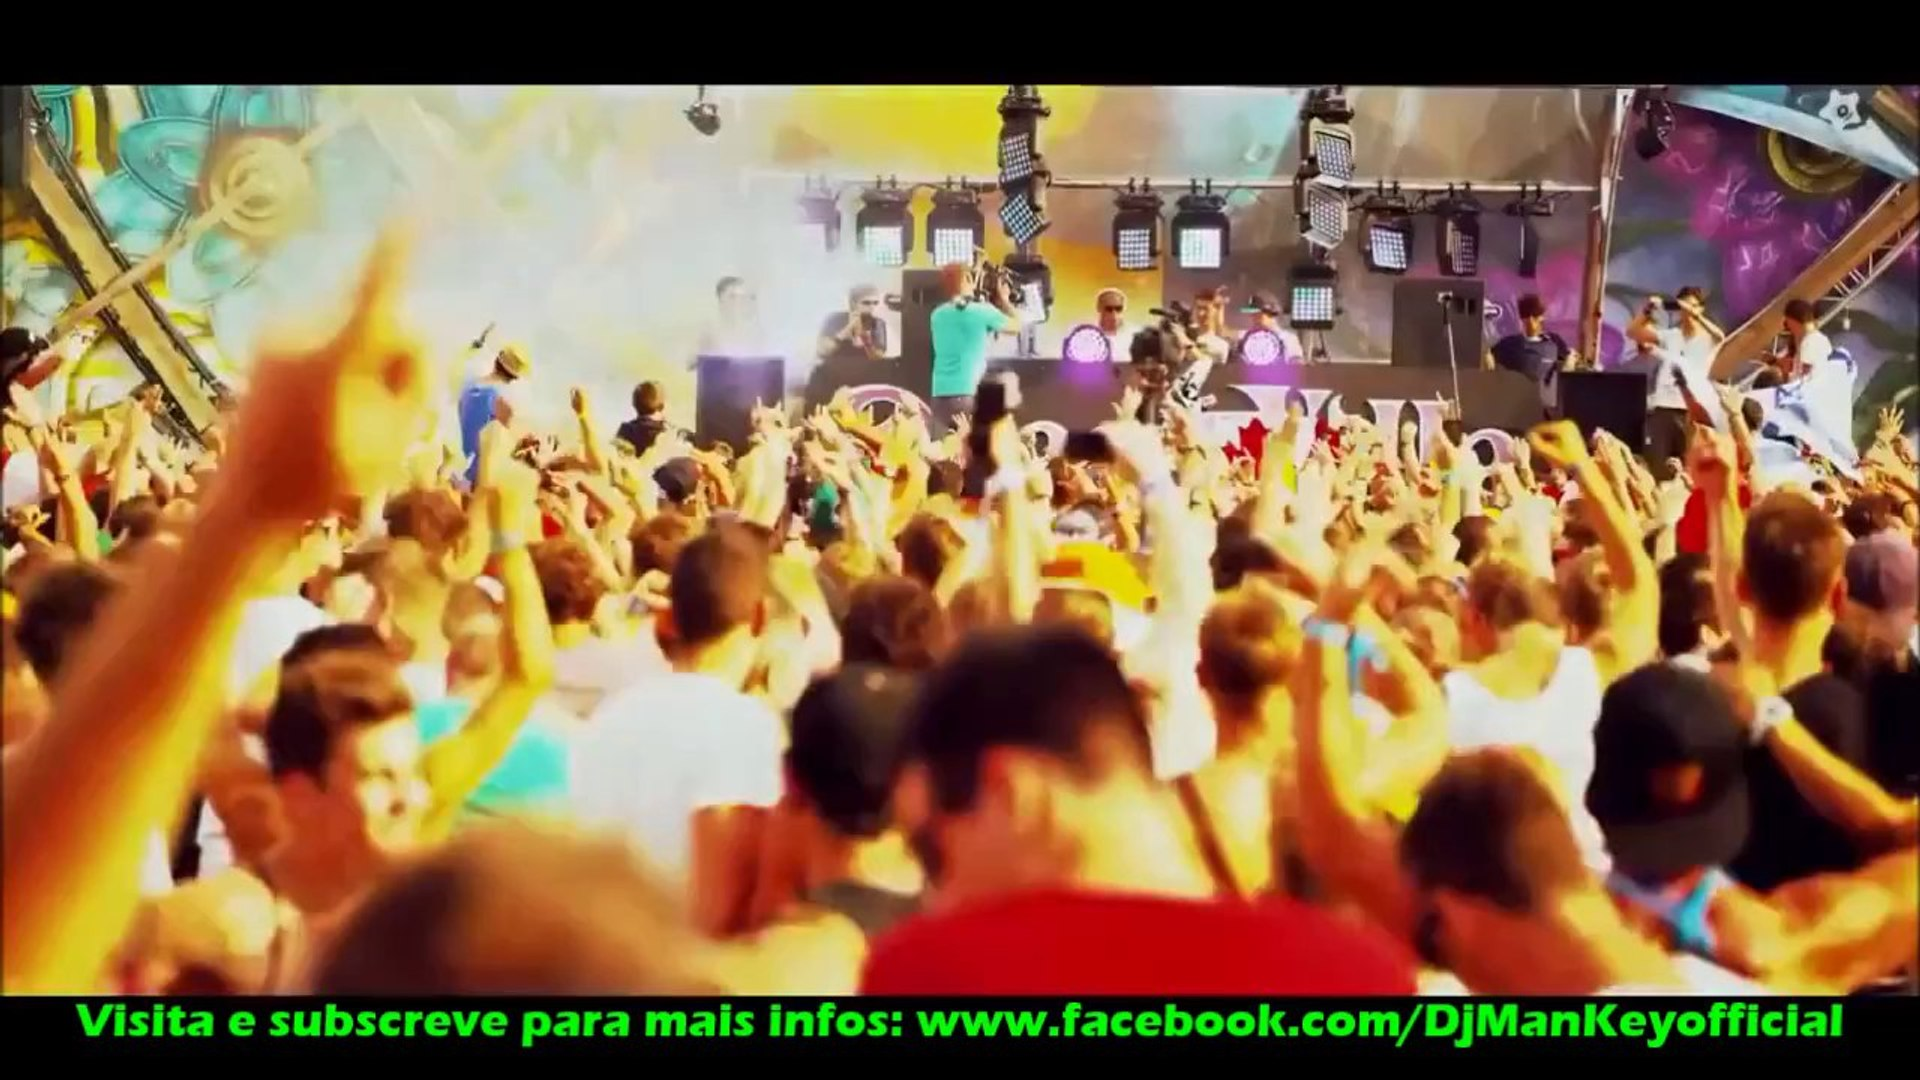 ★ DJ-MANKEY PORTUGAL @ MEGAMIX TOP BALADA SERTANEJO BRASIL ★ PISTA DANCE HITS 2014 ♬